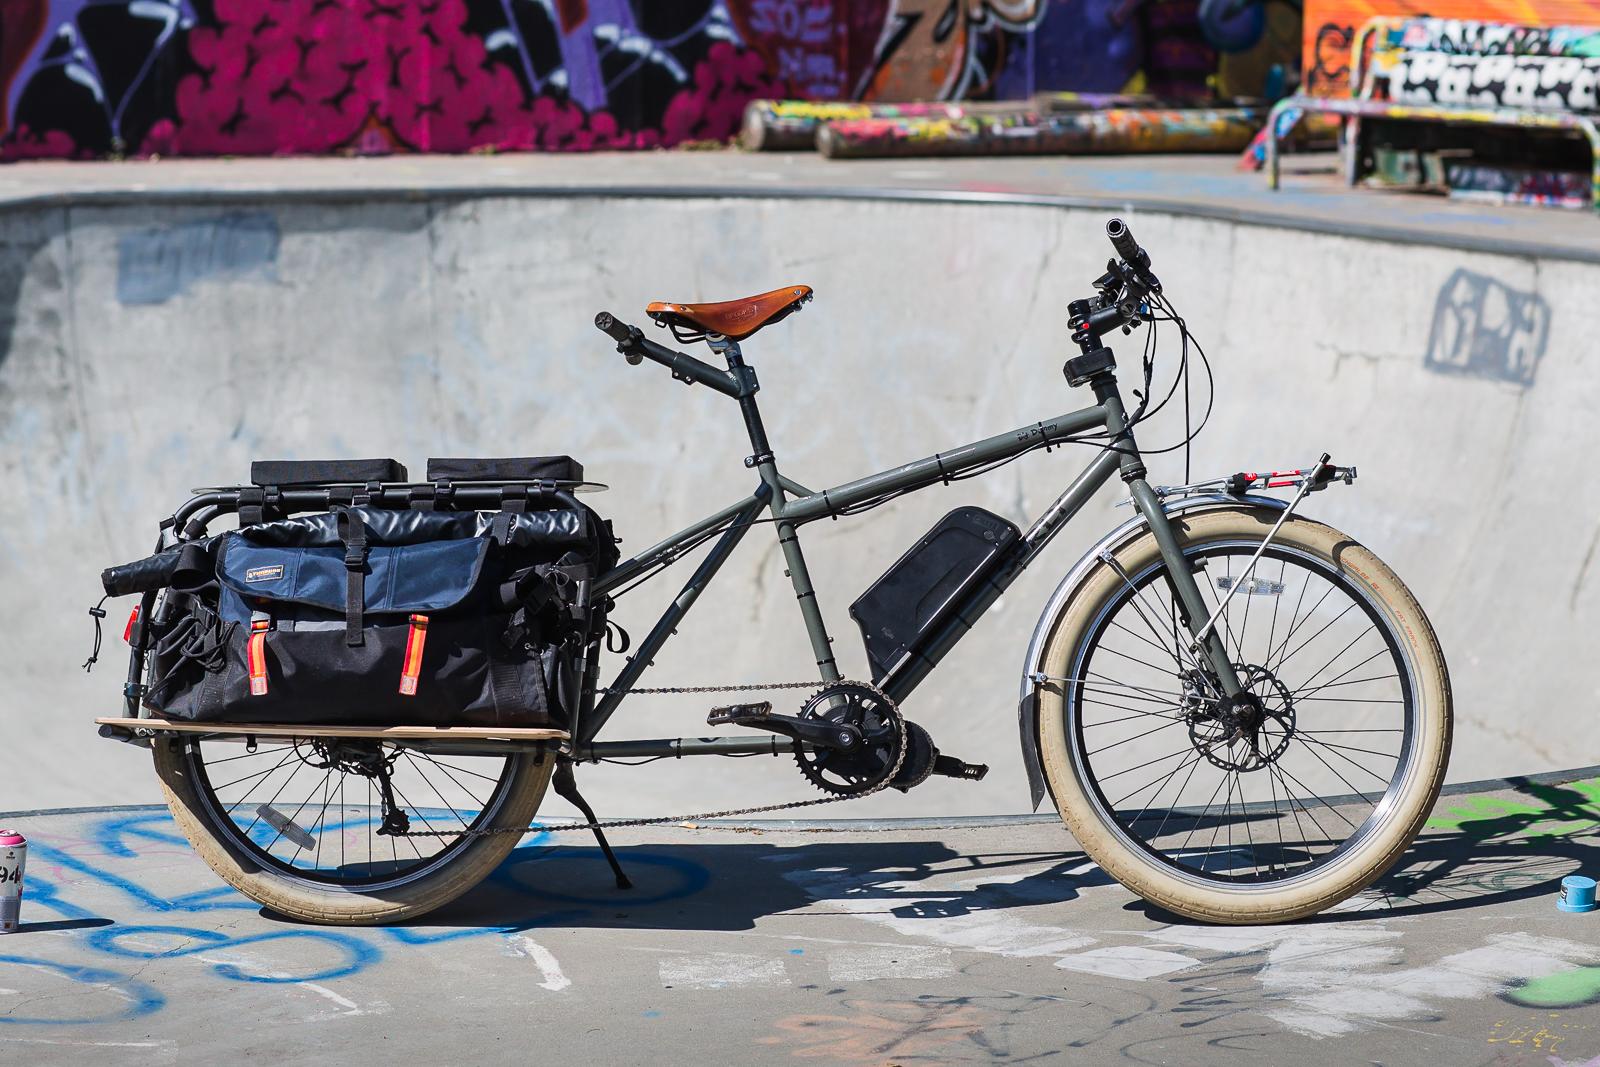 bygge sykkelhjul i oslo